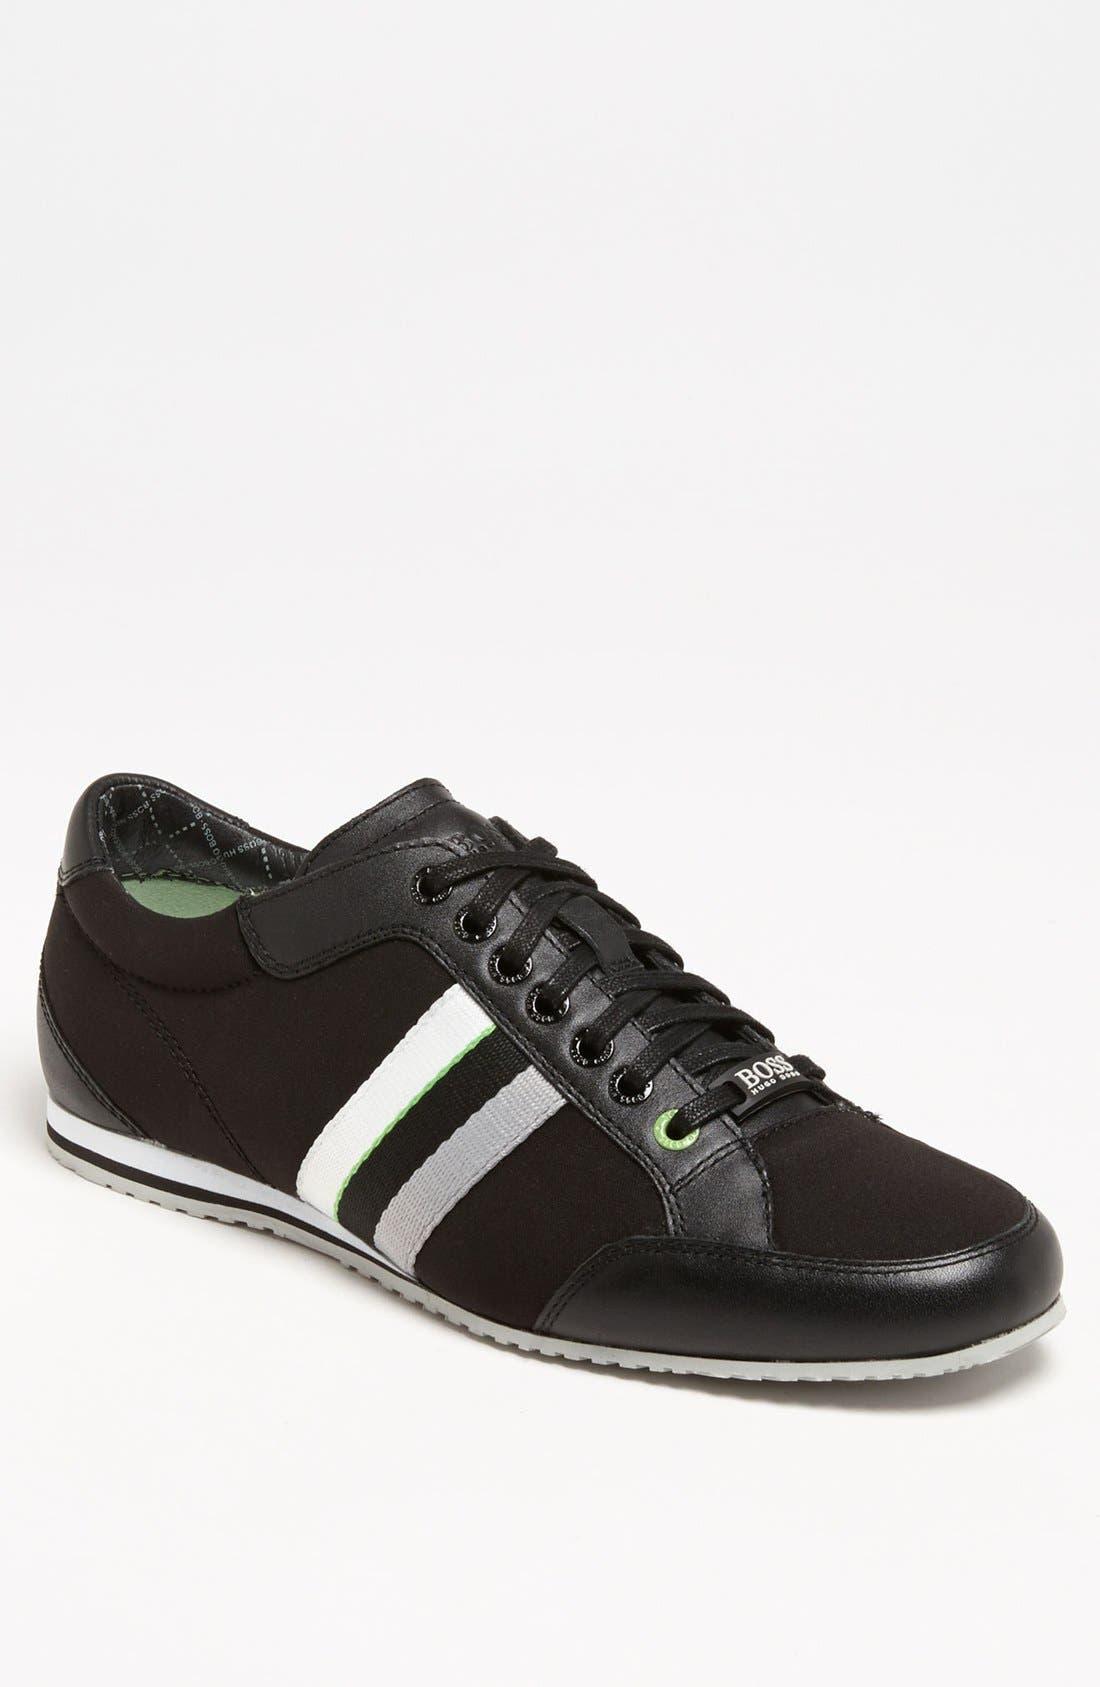 Main Image - BOSS Green 'Victoire' Sneaker